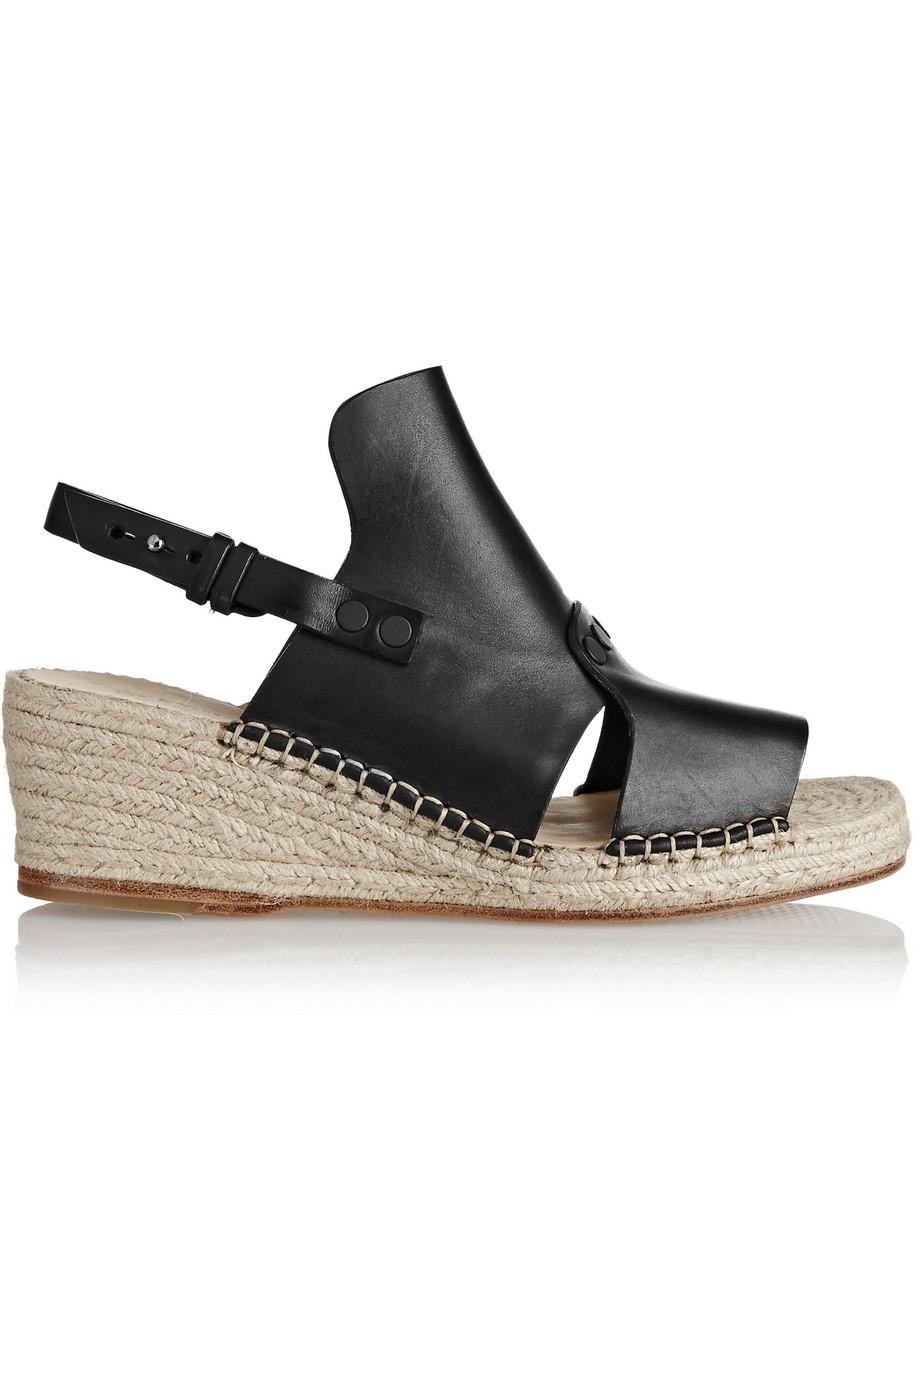 f2d8943c956 Lyst - Rag   Bone Sayre Ii Leather Espadrille Wedge Sandals in Black